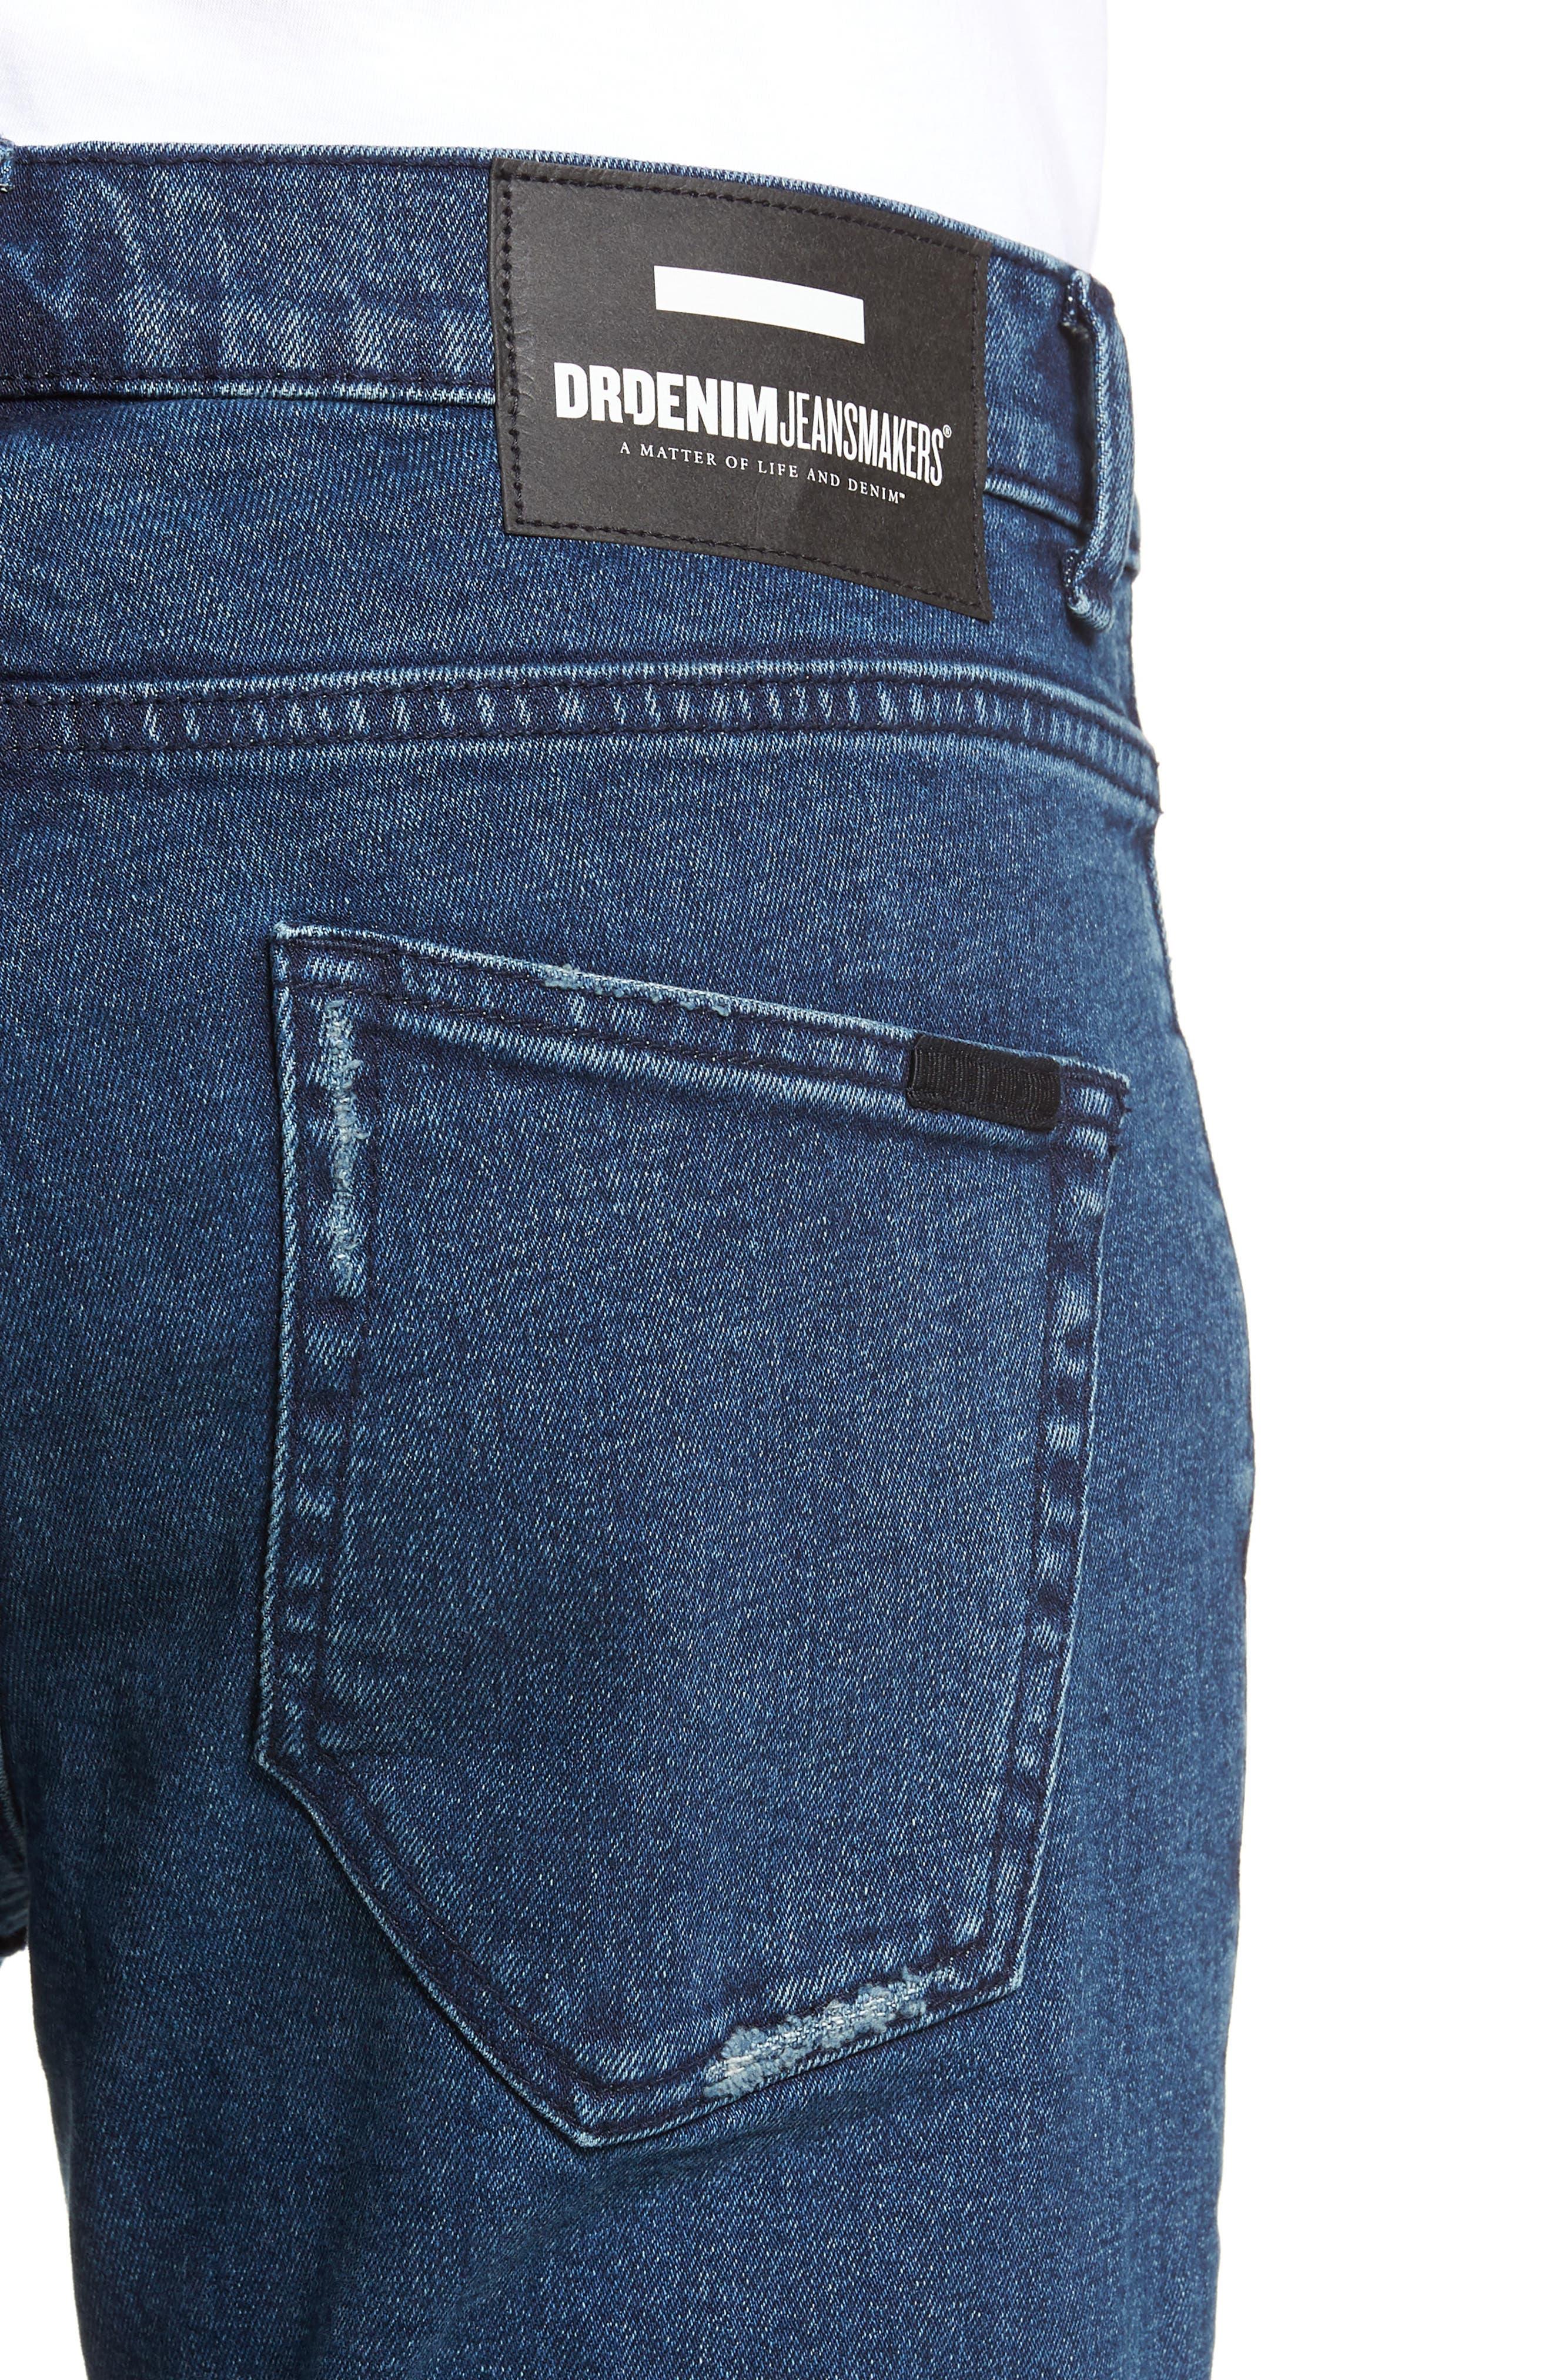 Clark Slim Straight Leg Jeans,                             Alternate thumbnail 4, color,                             WORN ASH BLUE DAMAGED